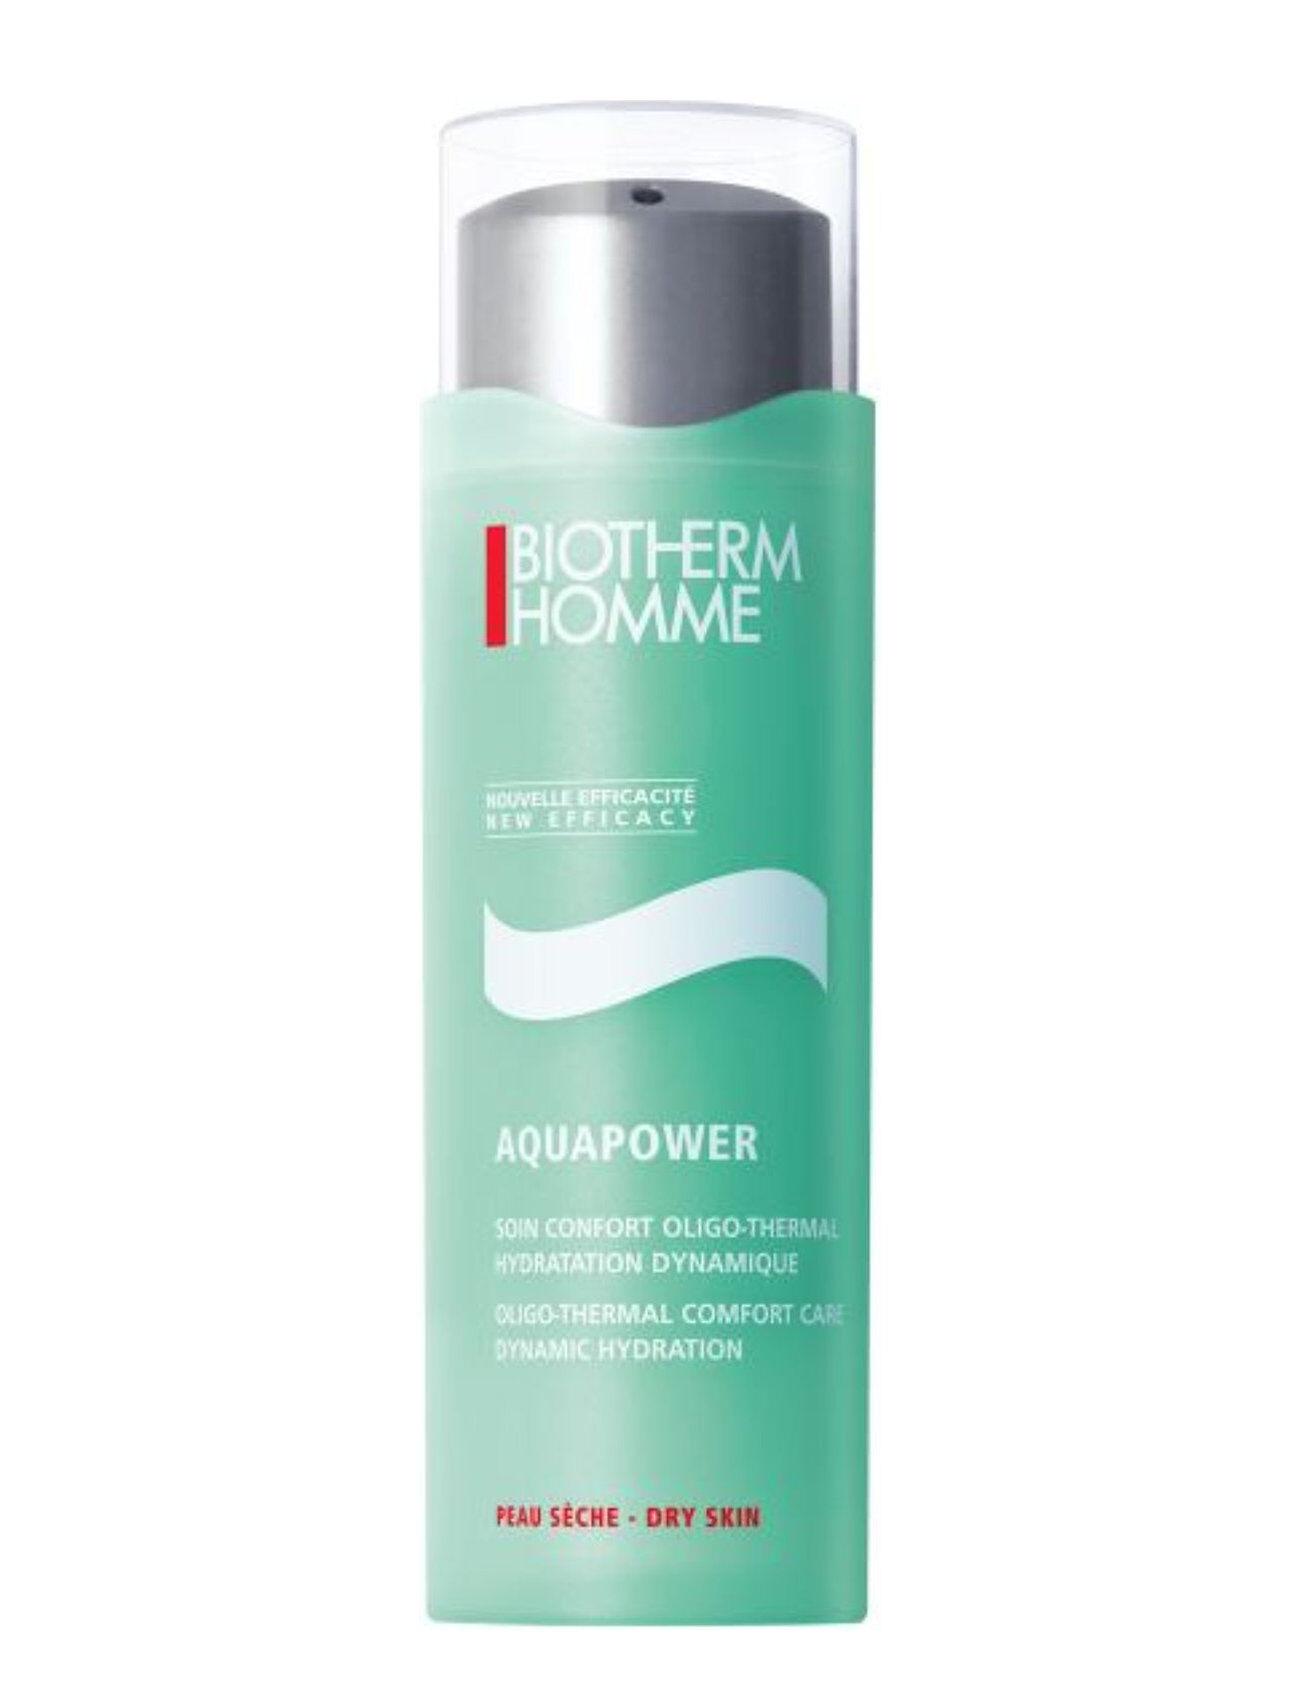 Biotherm Homme Aquapower Creme 75 Ml.